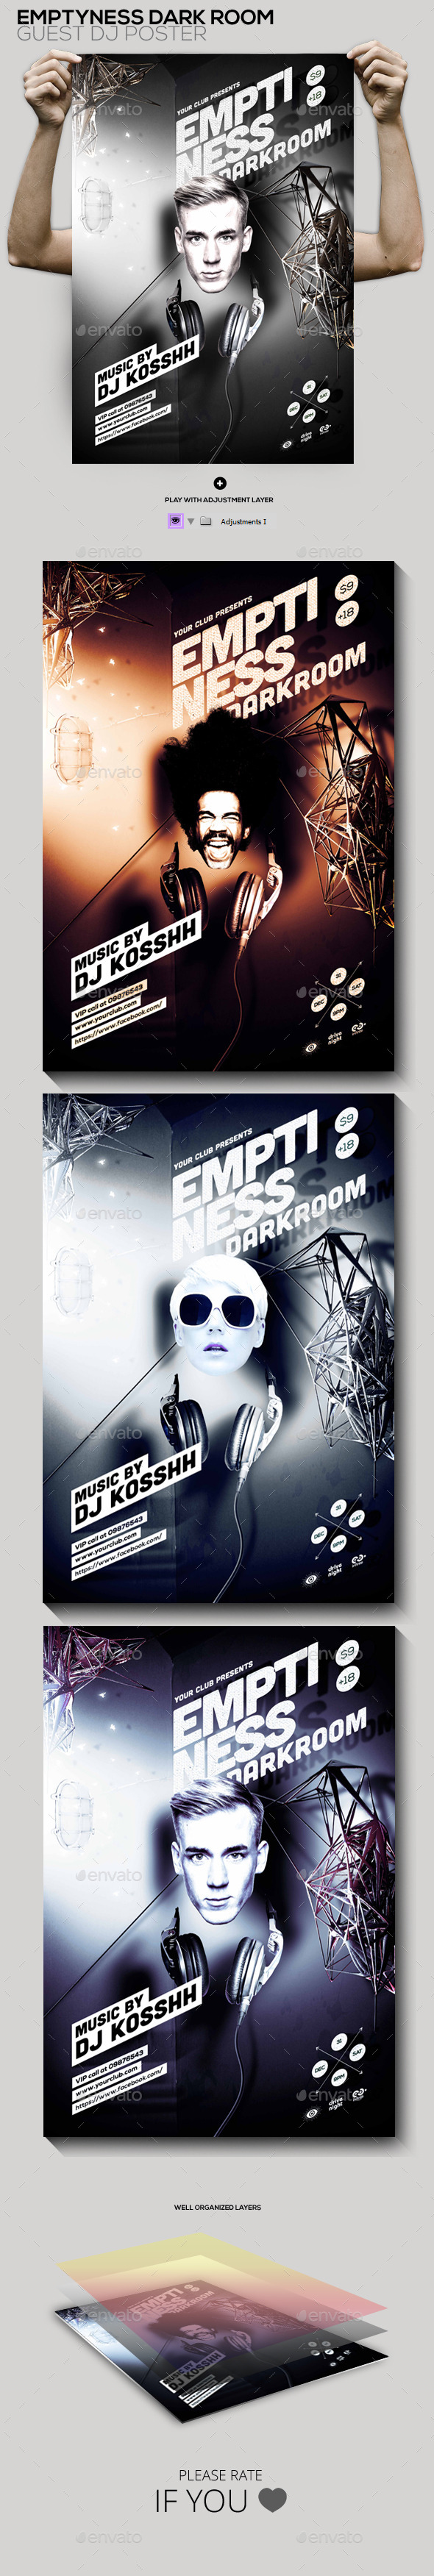 Emptiness Darkroom Guest Dj Party Flyer/Poster - Clubs & Parties Events